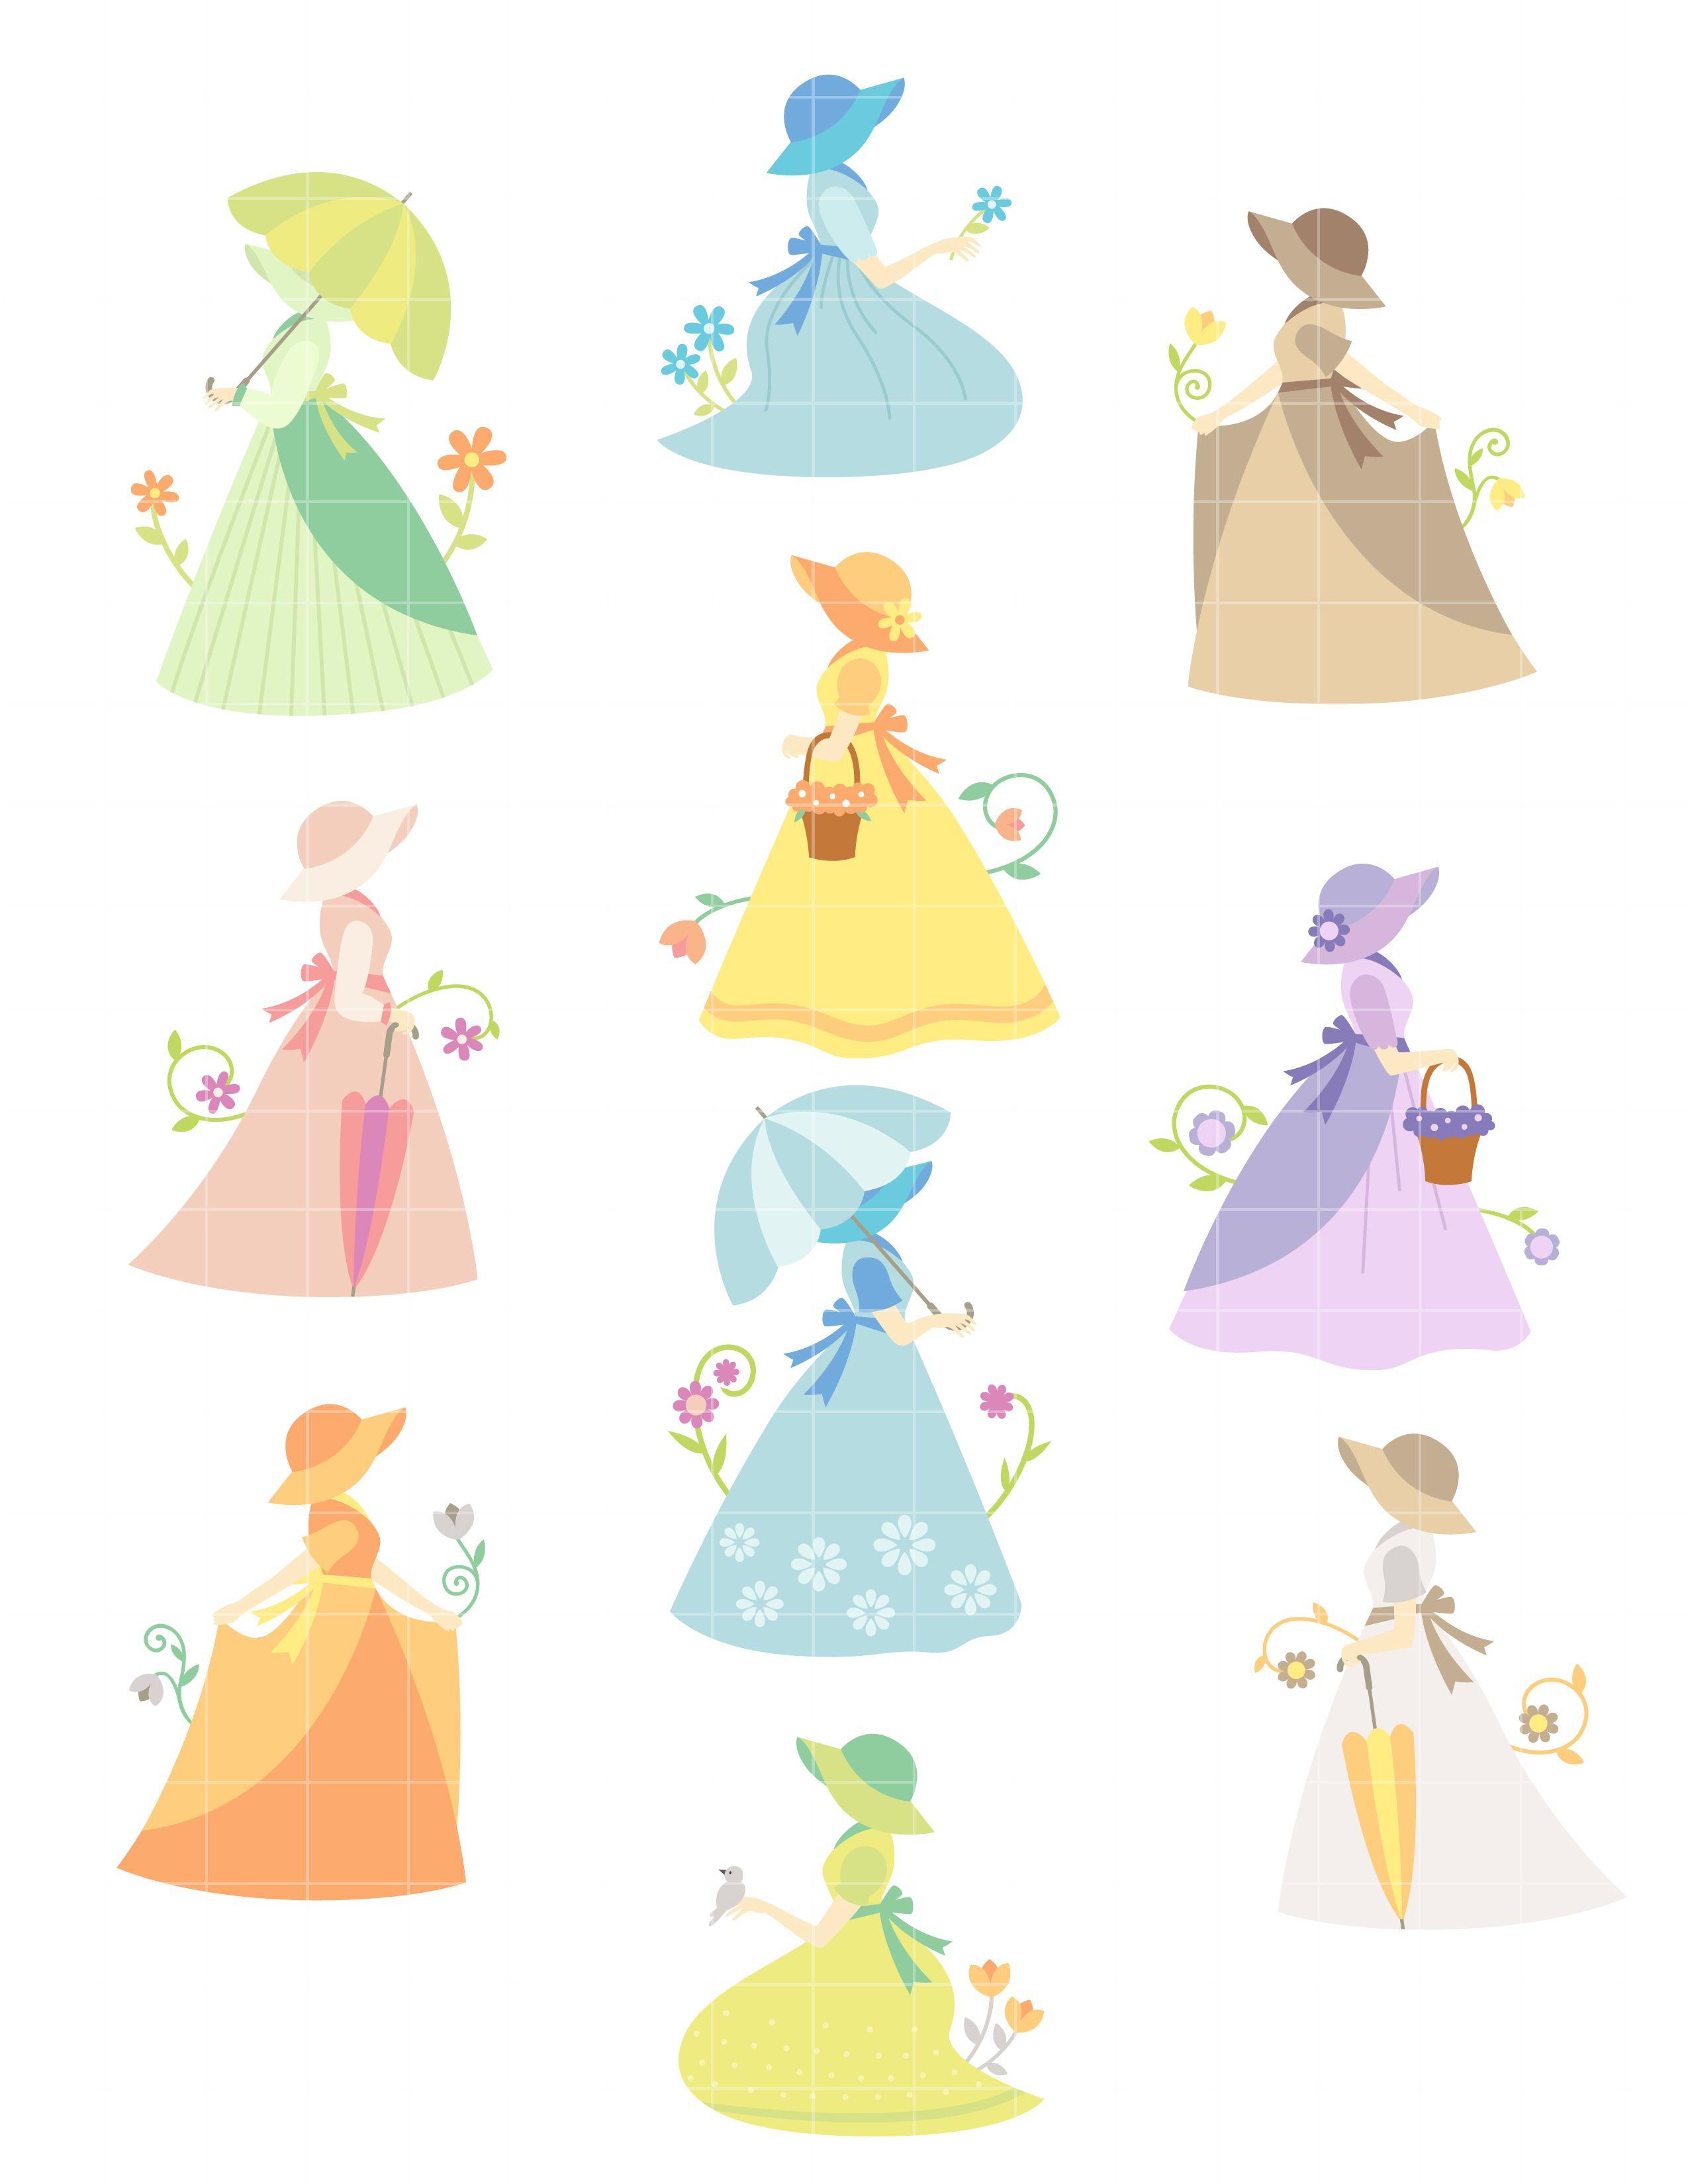 sue bonnet girls set semi exclusive clip art set for digitizing and rh pinterest com clipart for embroidery digitizing